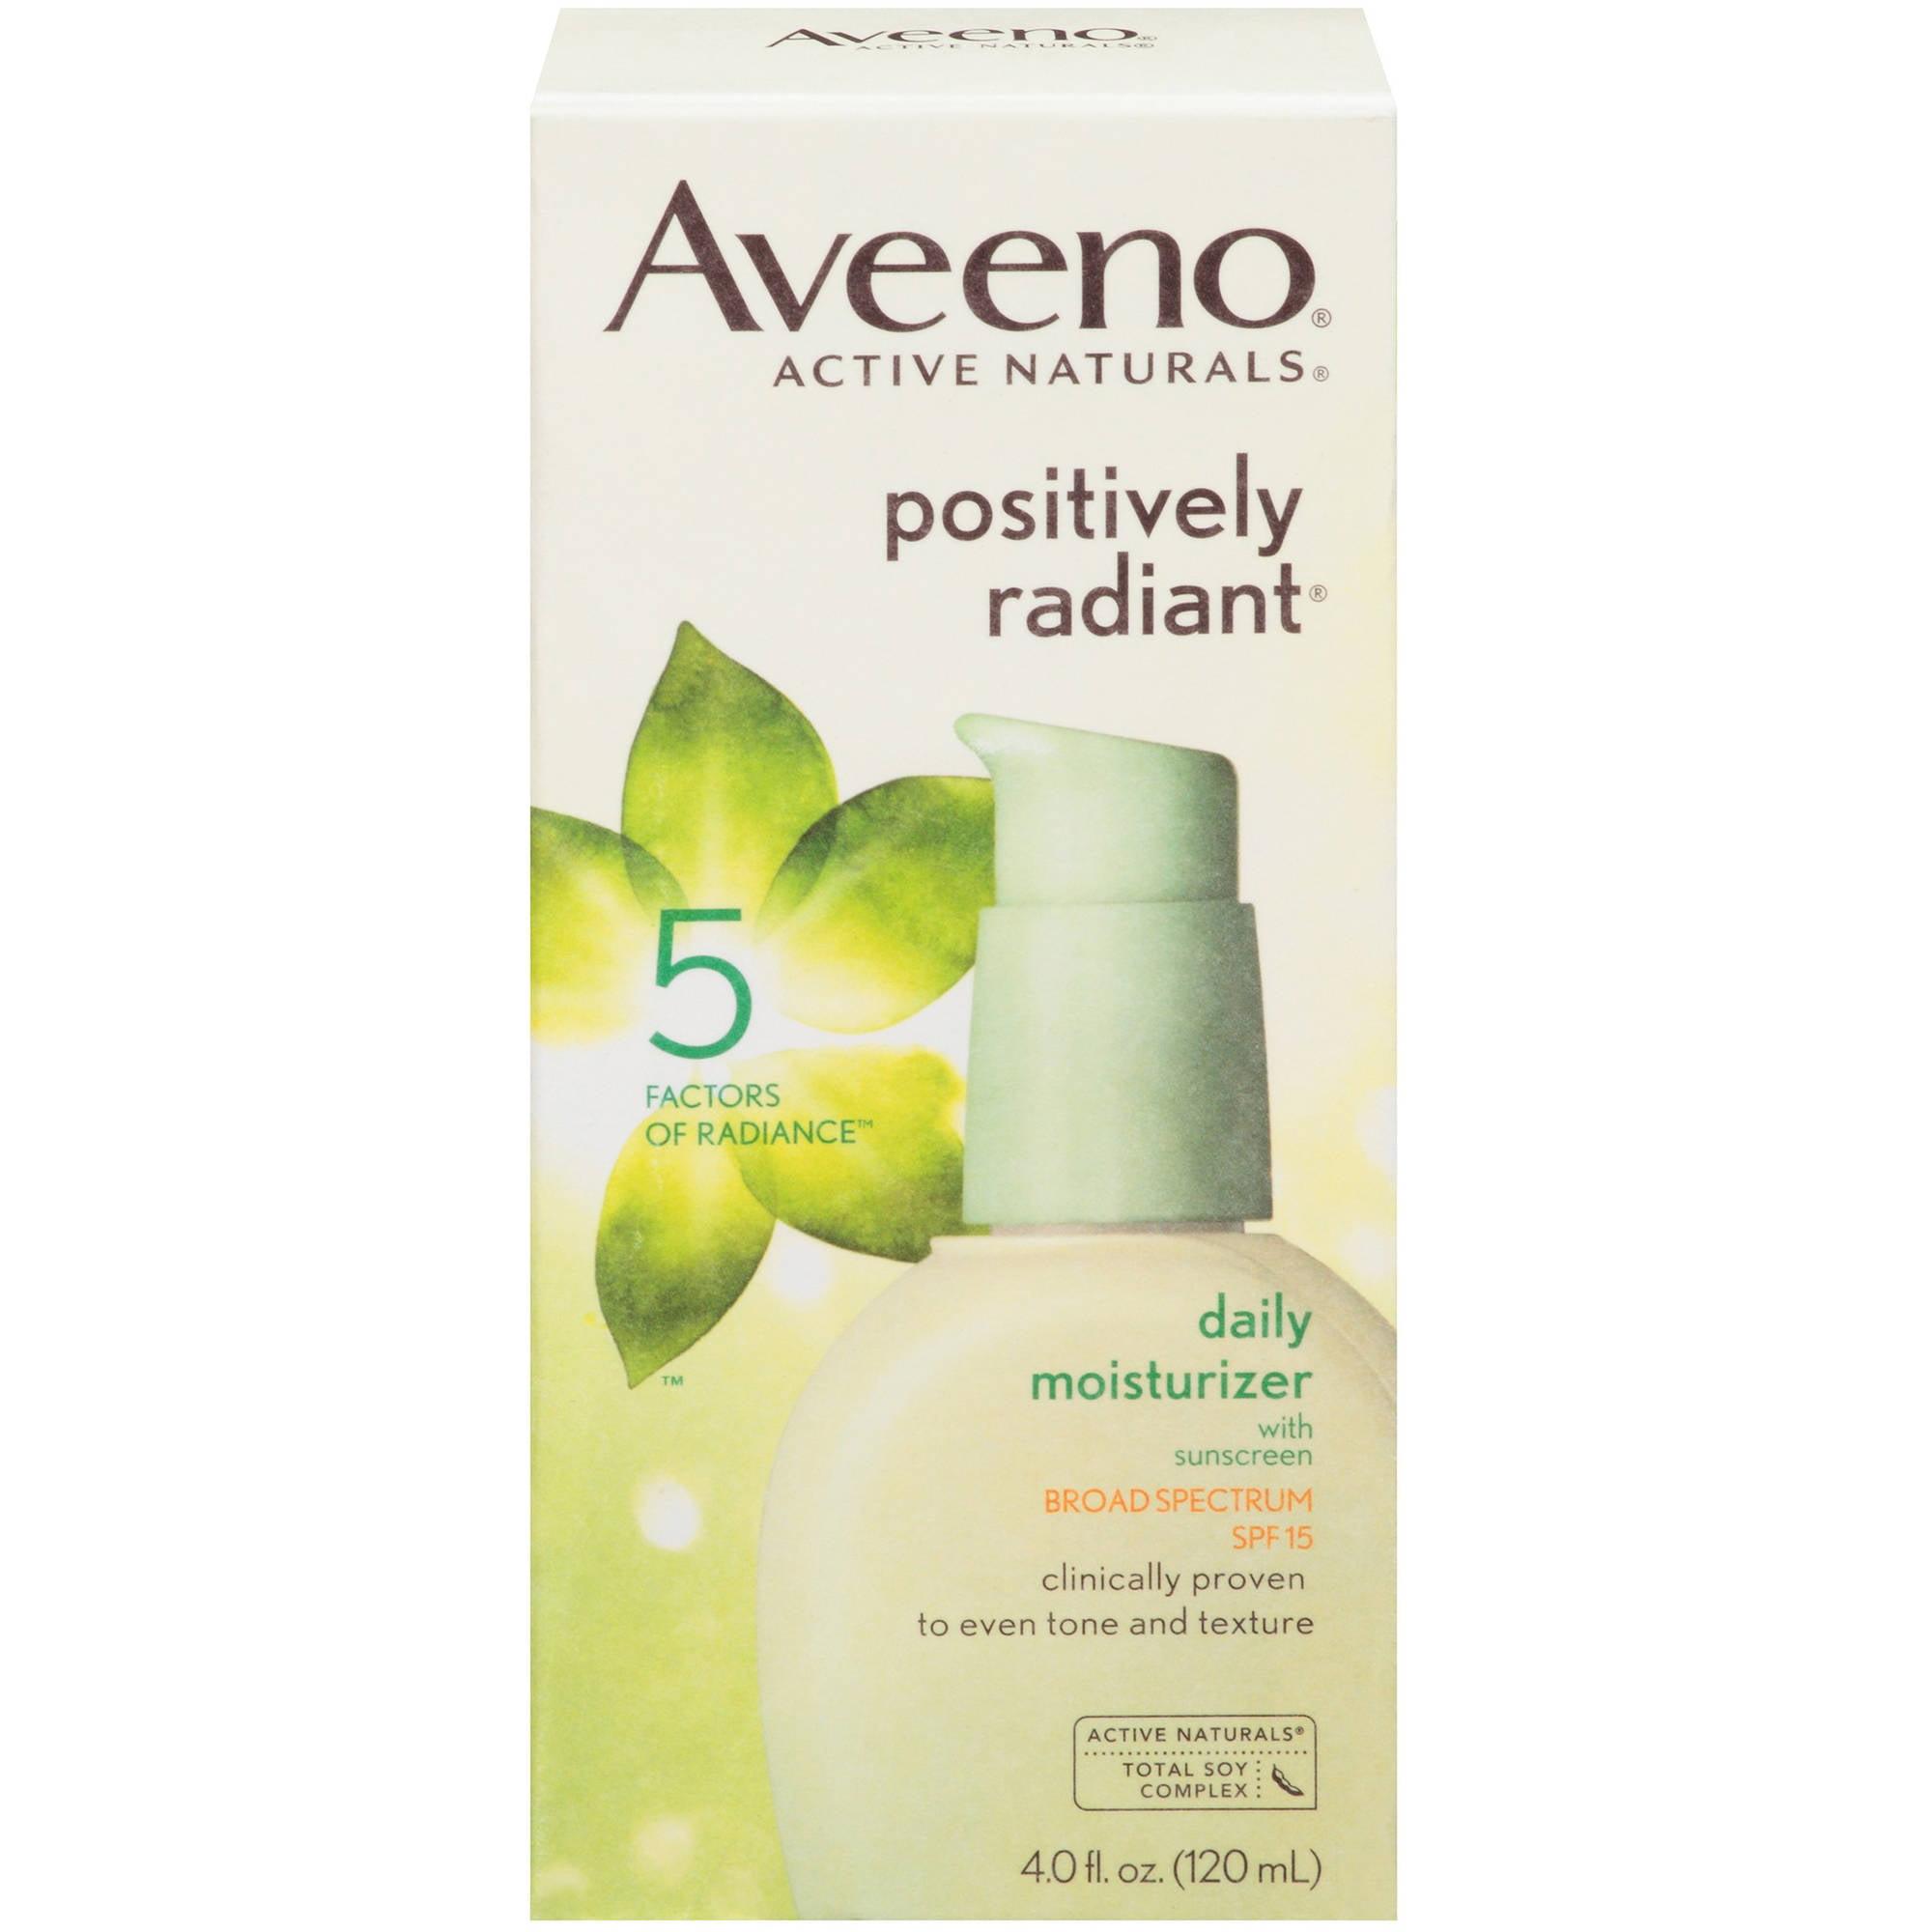 Aveeno Positively Radiant Daily Moisturizer, SPF 15 Facial Moisturizers, 4 fl oz